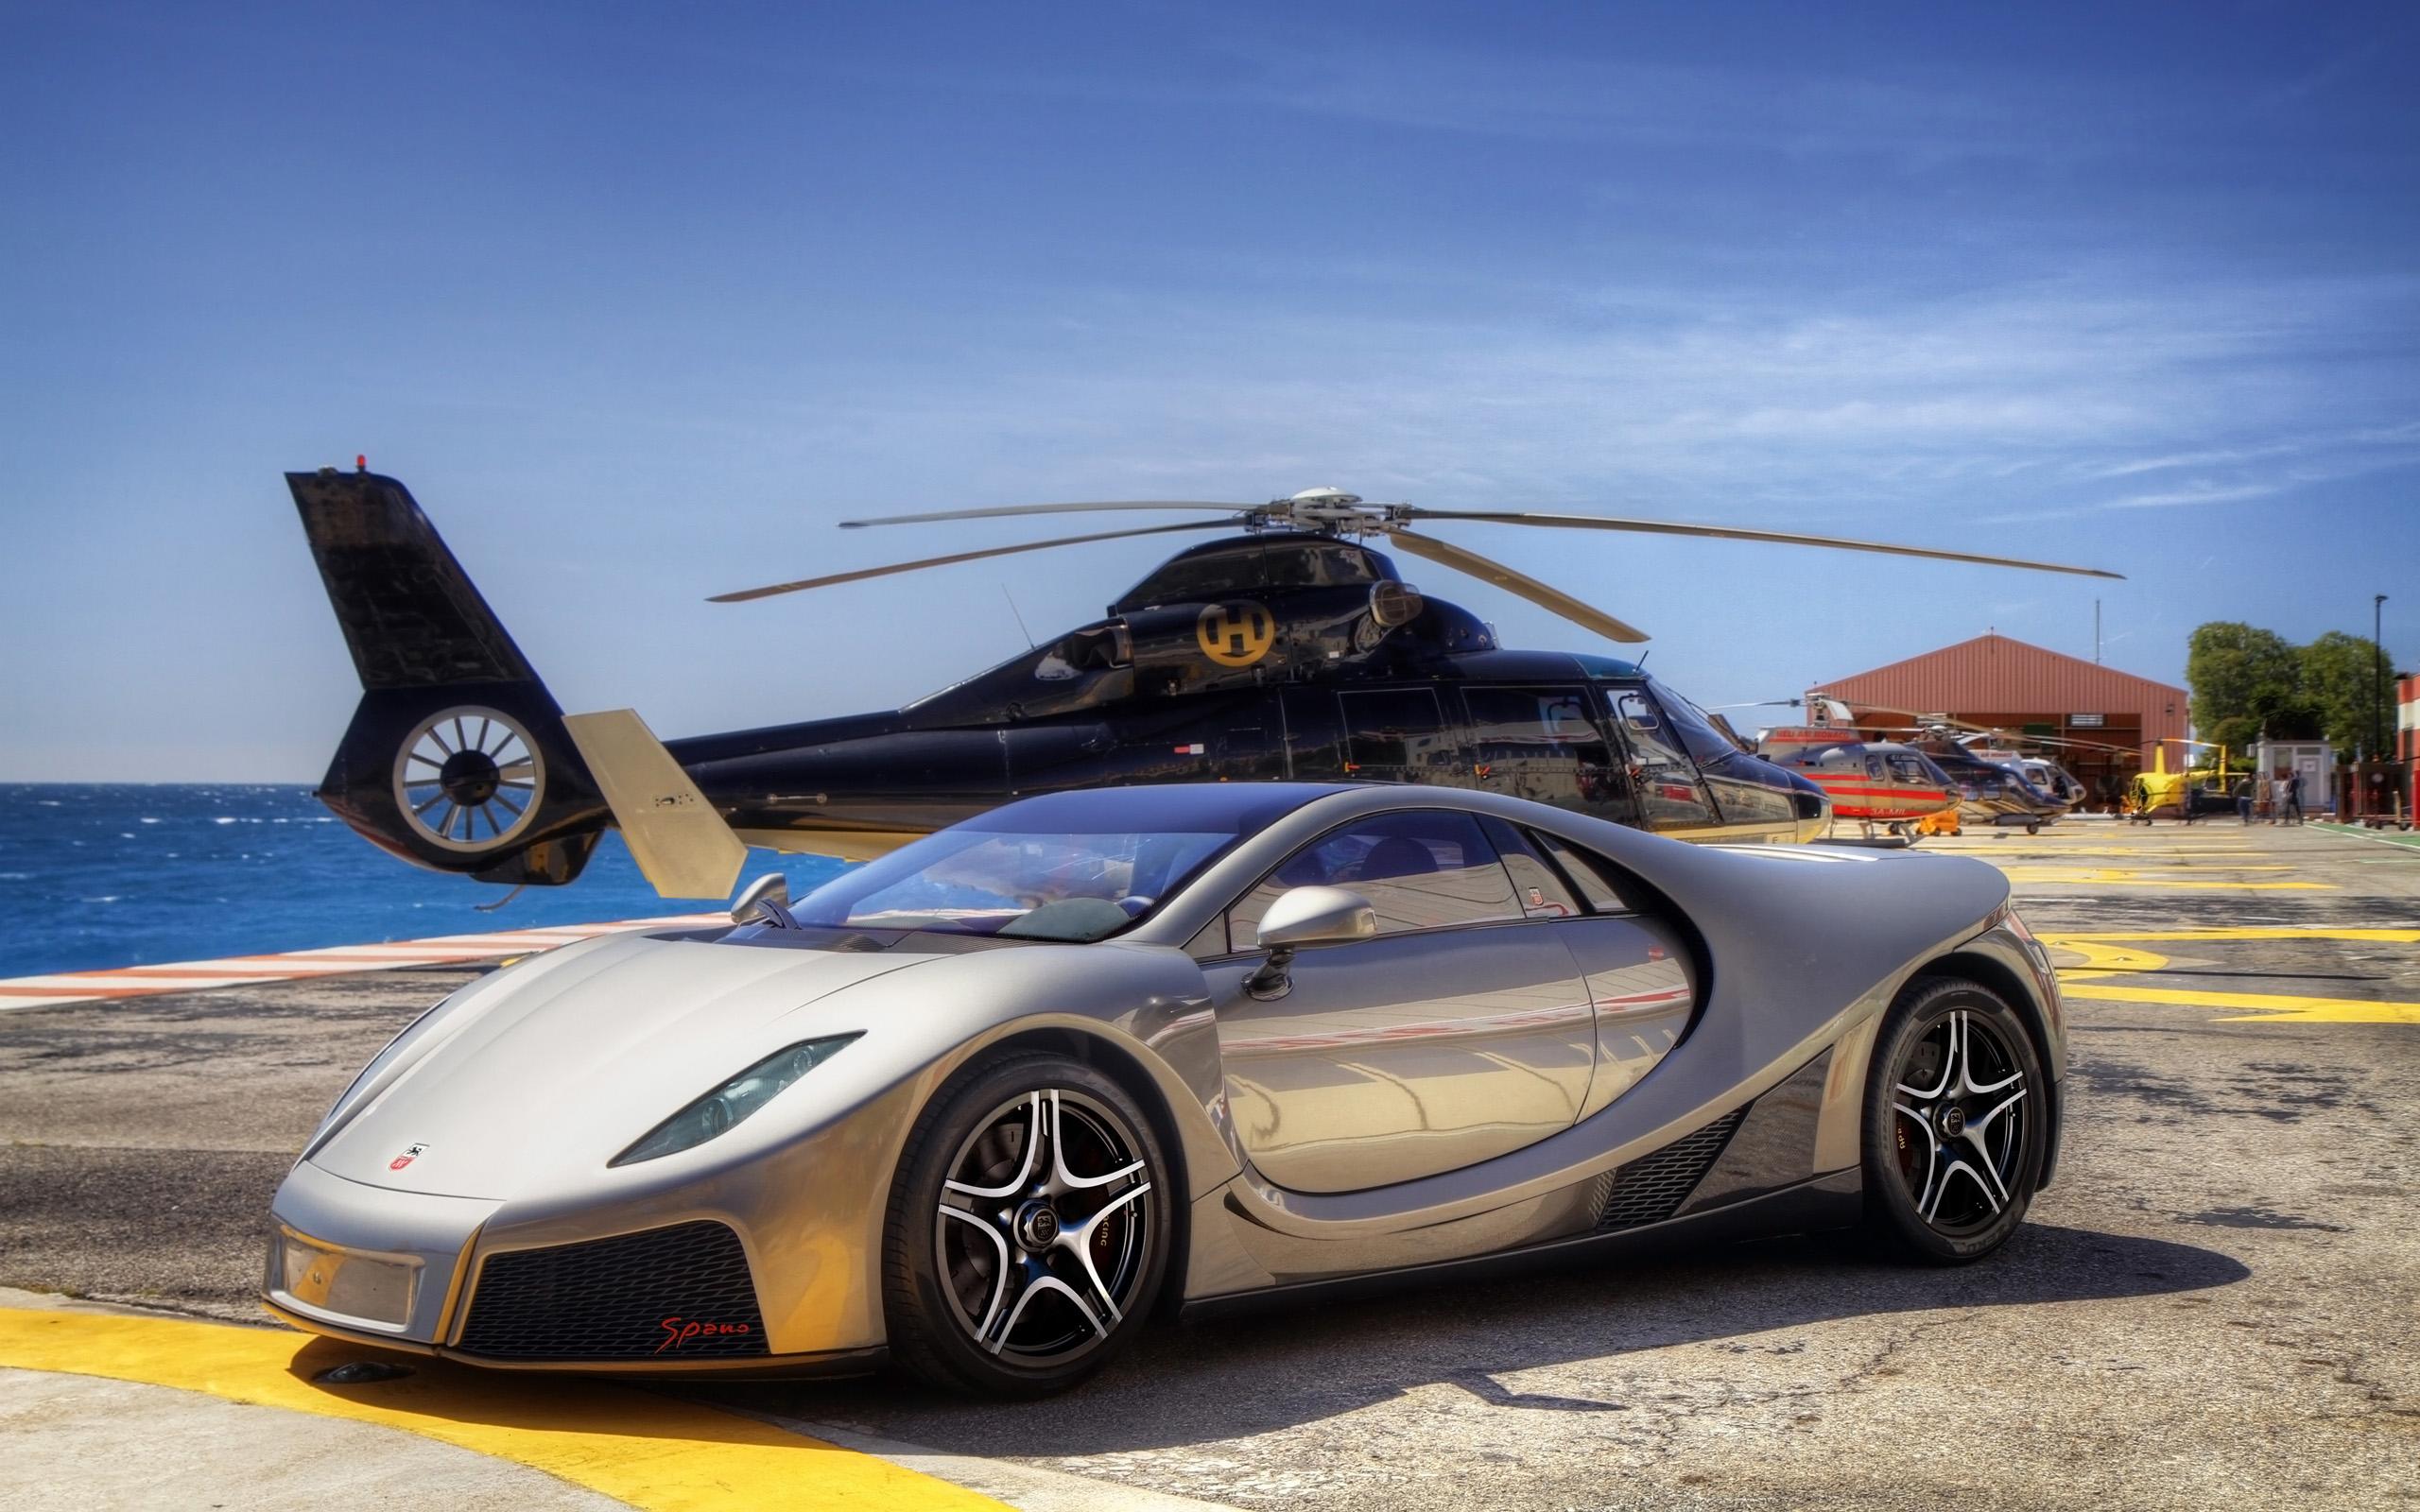 Charmant 2014 GTA Spano Silver